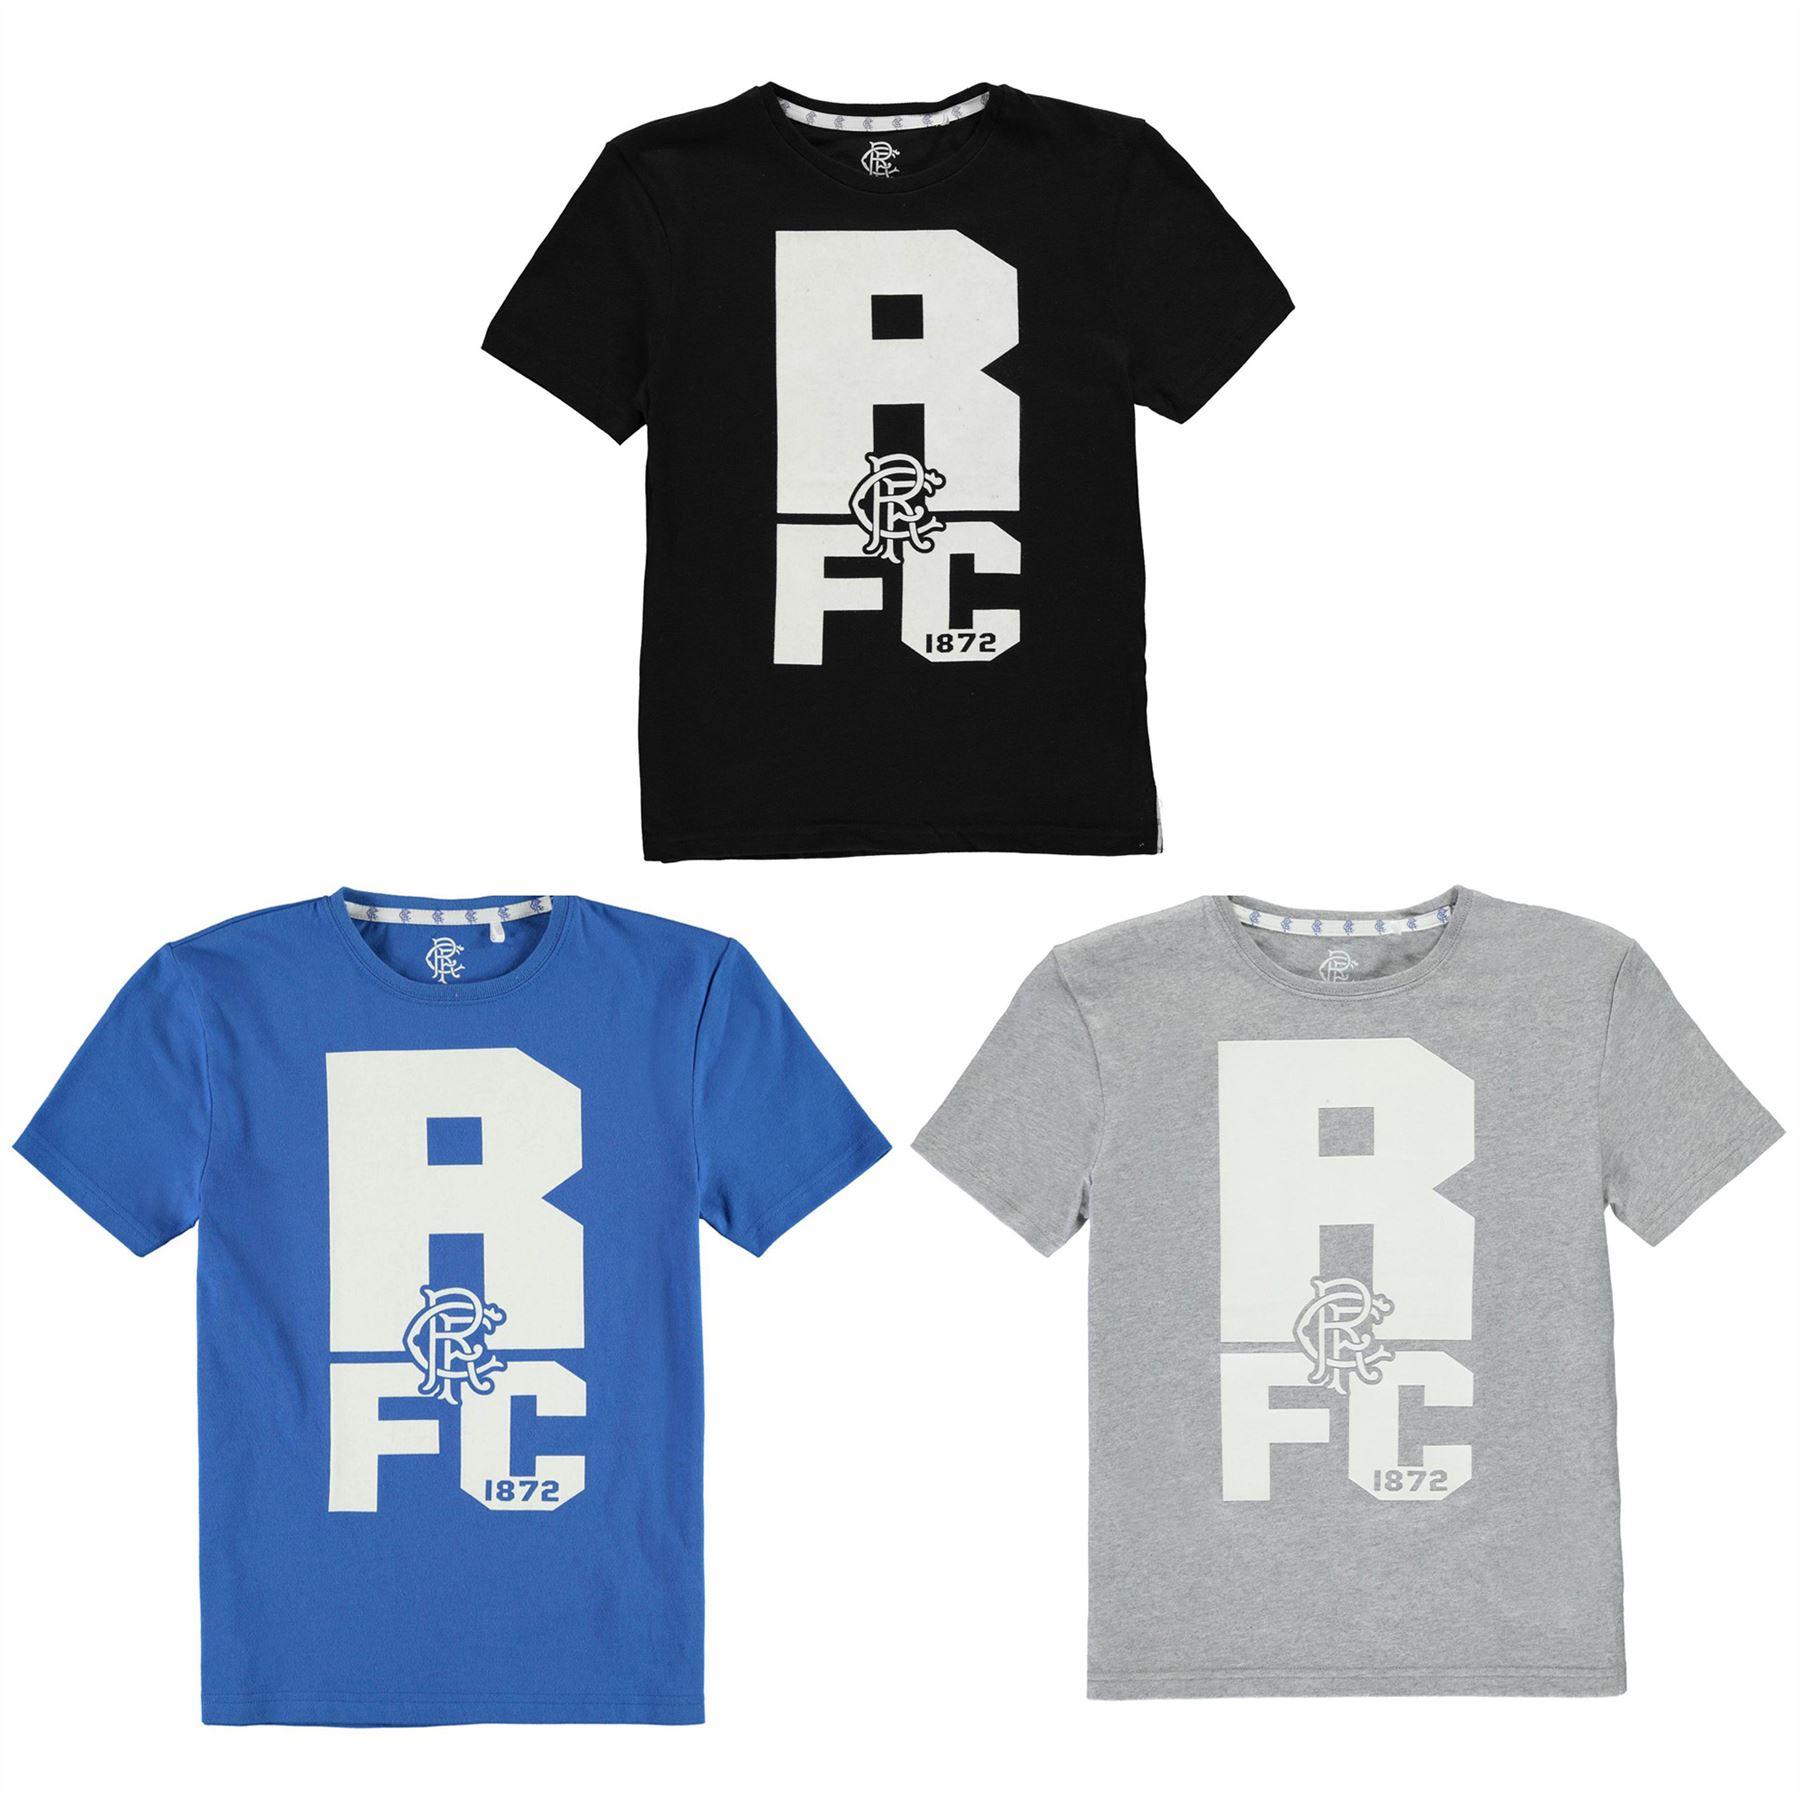 Glasgow Rangers FC  T-Shirt  Boys  Top Tee Shirt Football Soccer Age 13